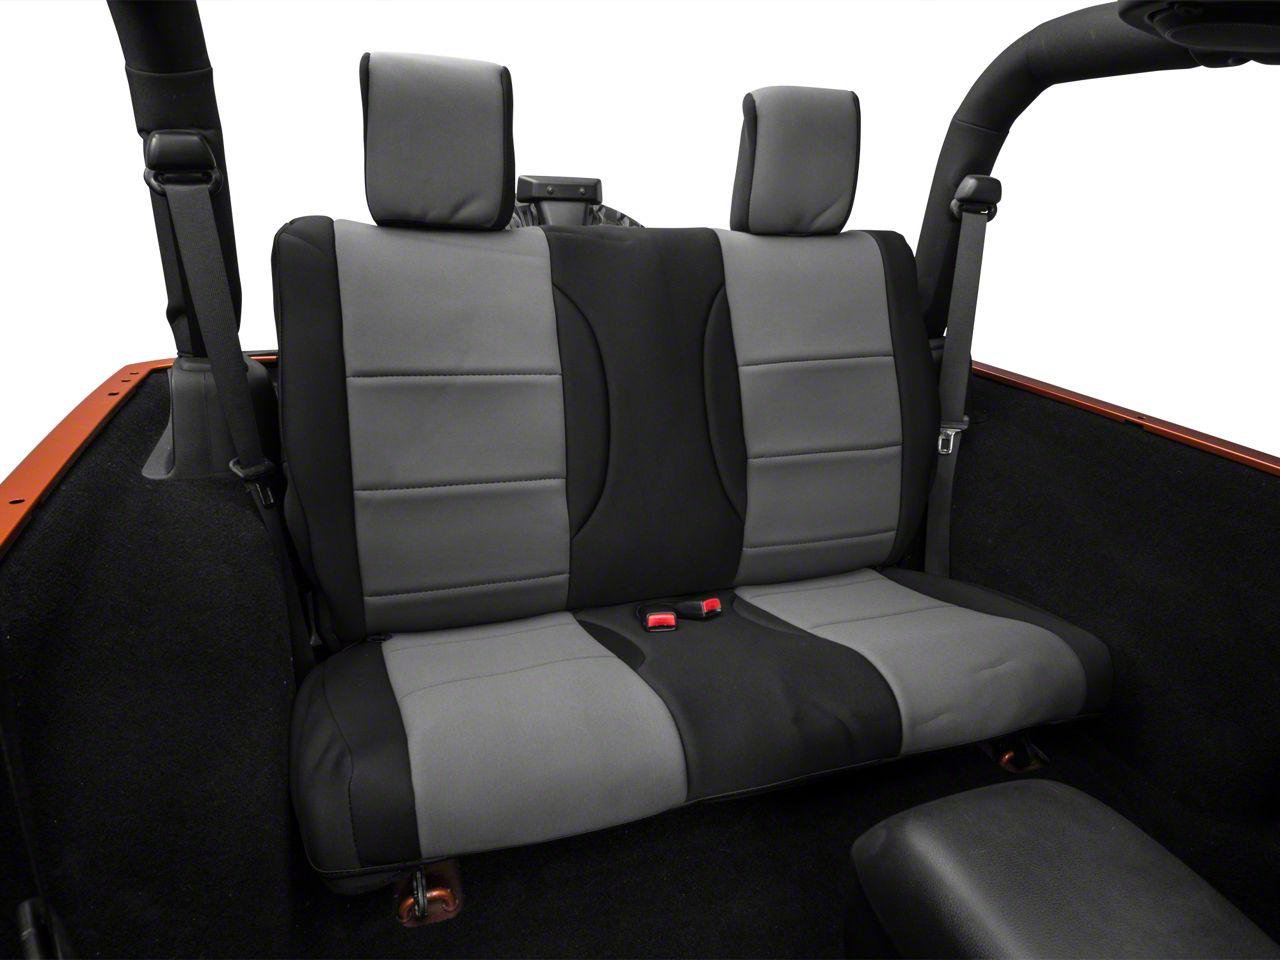 Add Rugged Ridge Neoprene Rear Seat Cover - Black/Gray (07-17 Wrangler JK 4 Door)